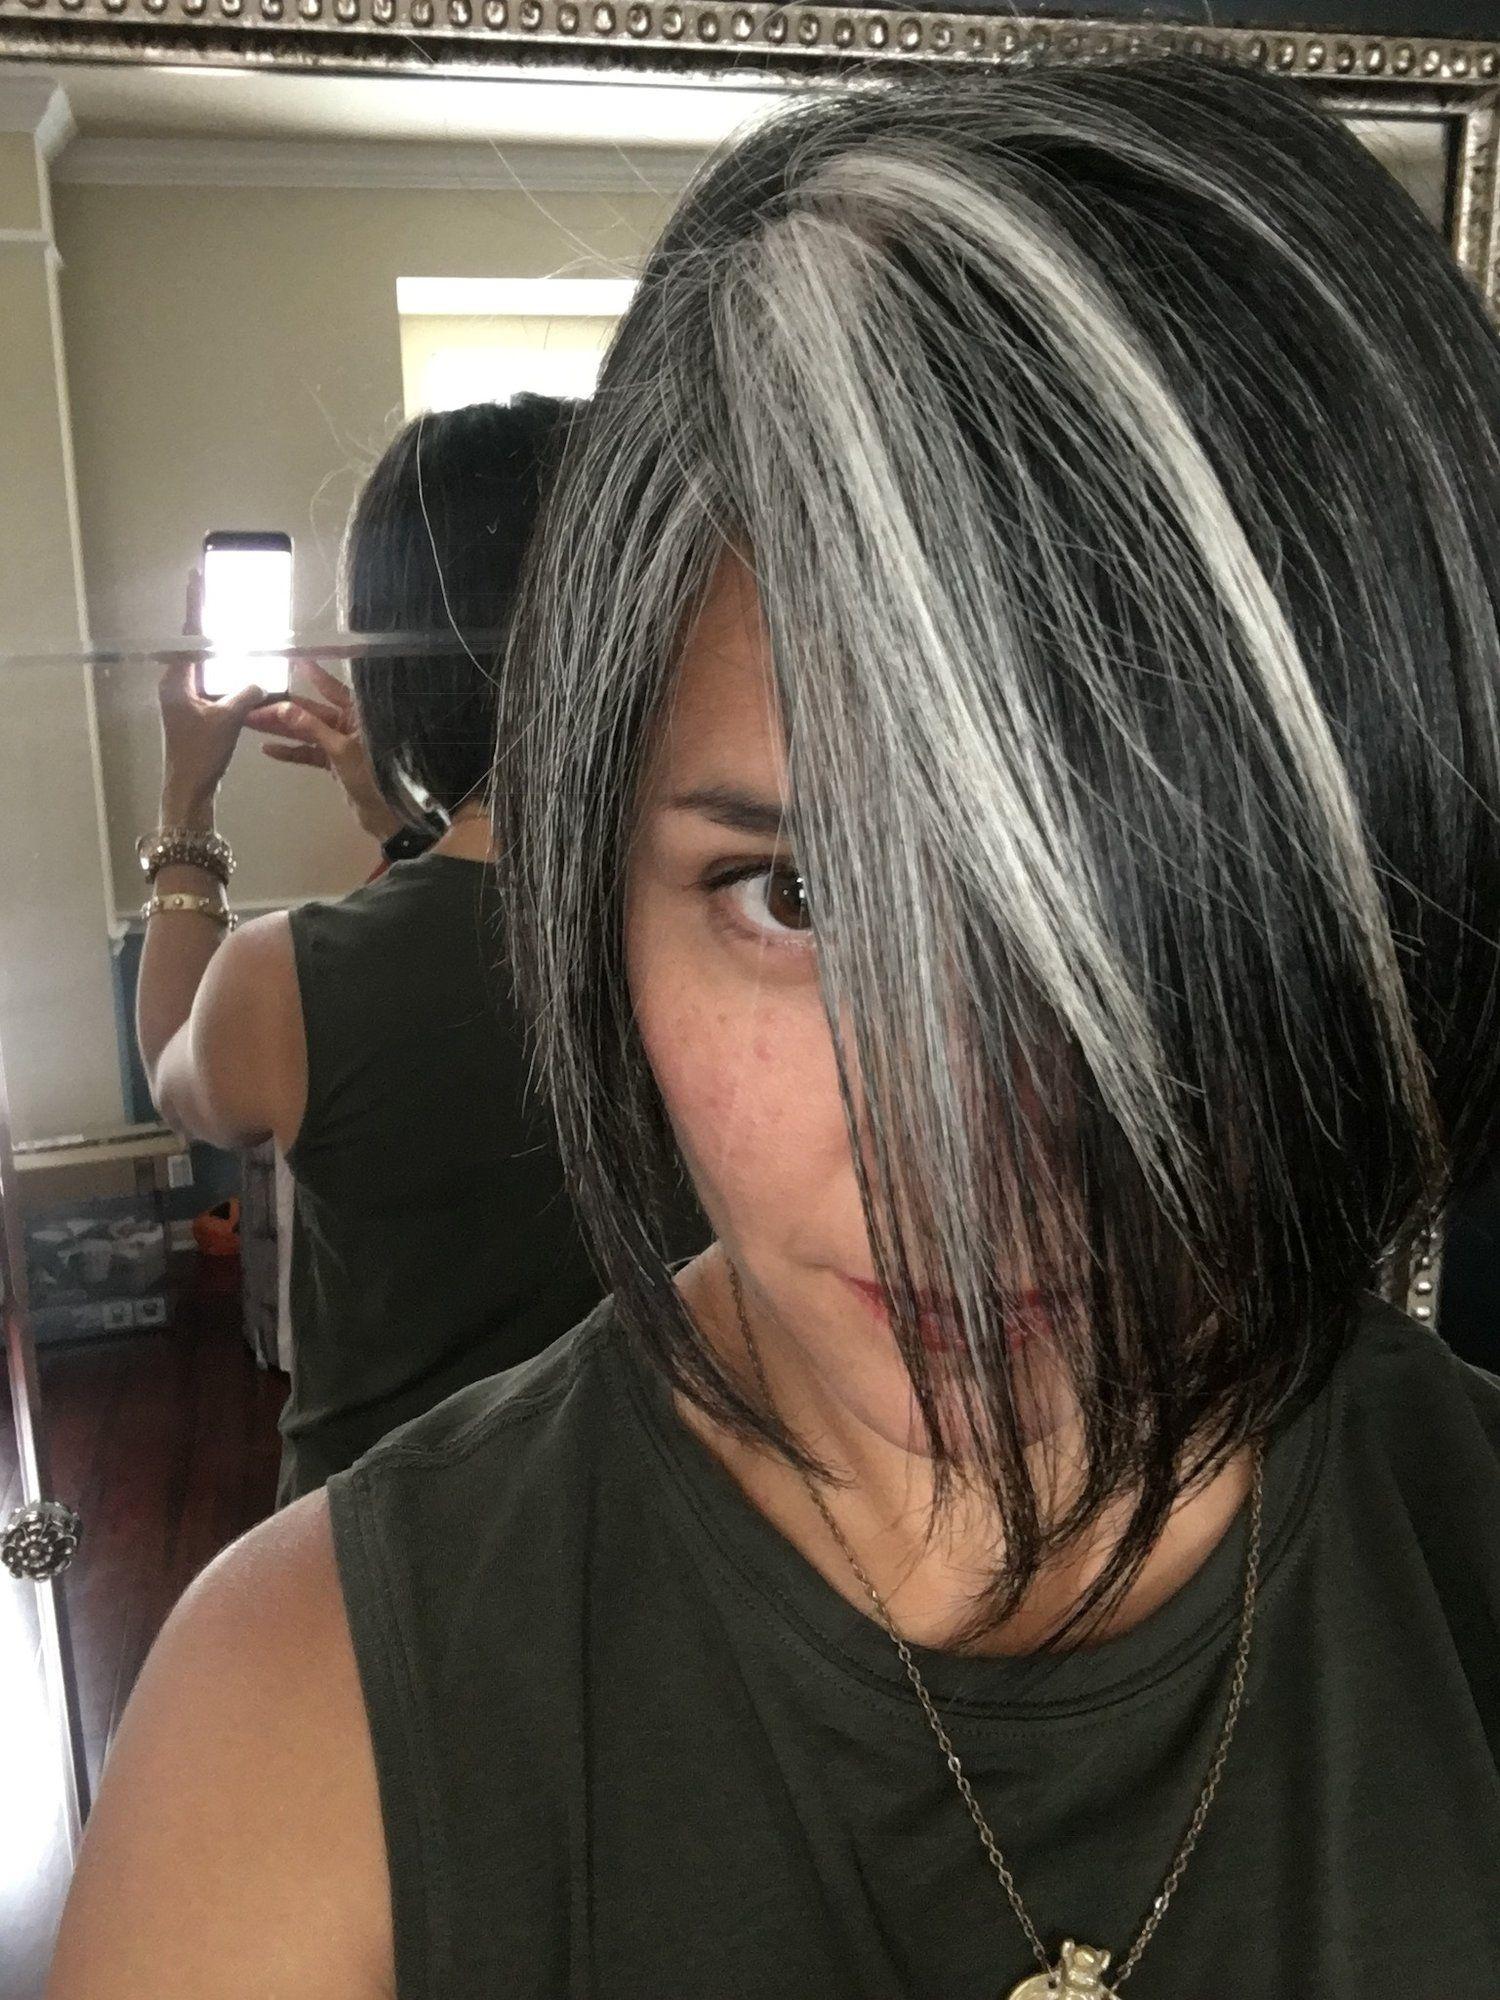 Gray Hair Don T Care Salt And Pepper Gray Hair Grey Hair Silver Hair White Hair Don T Care Blending Gray Hair Gray Hair Growing Out Gray Hair Highlights